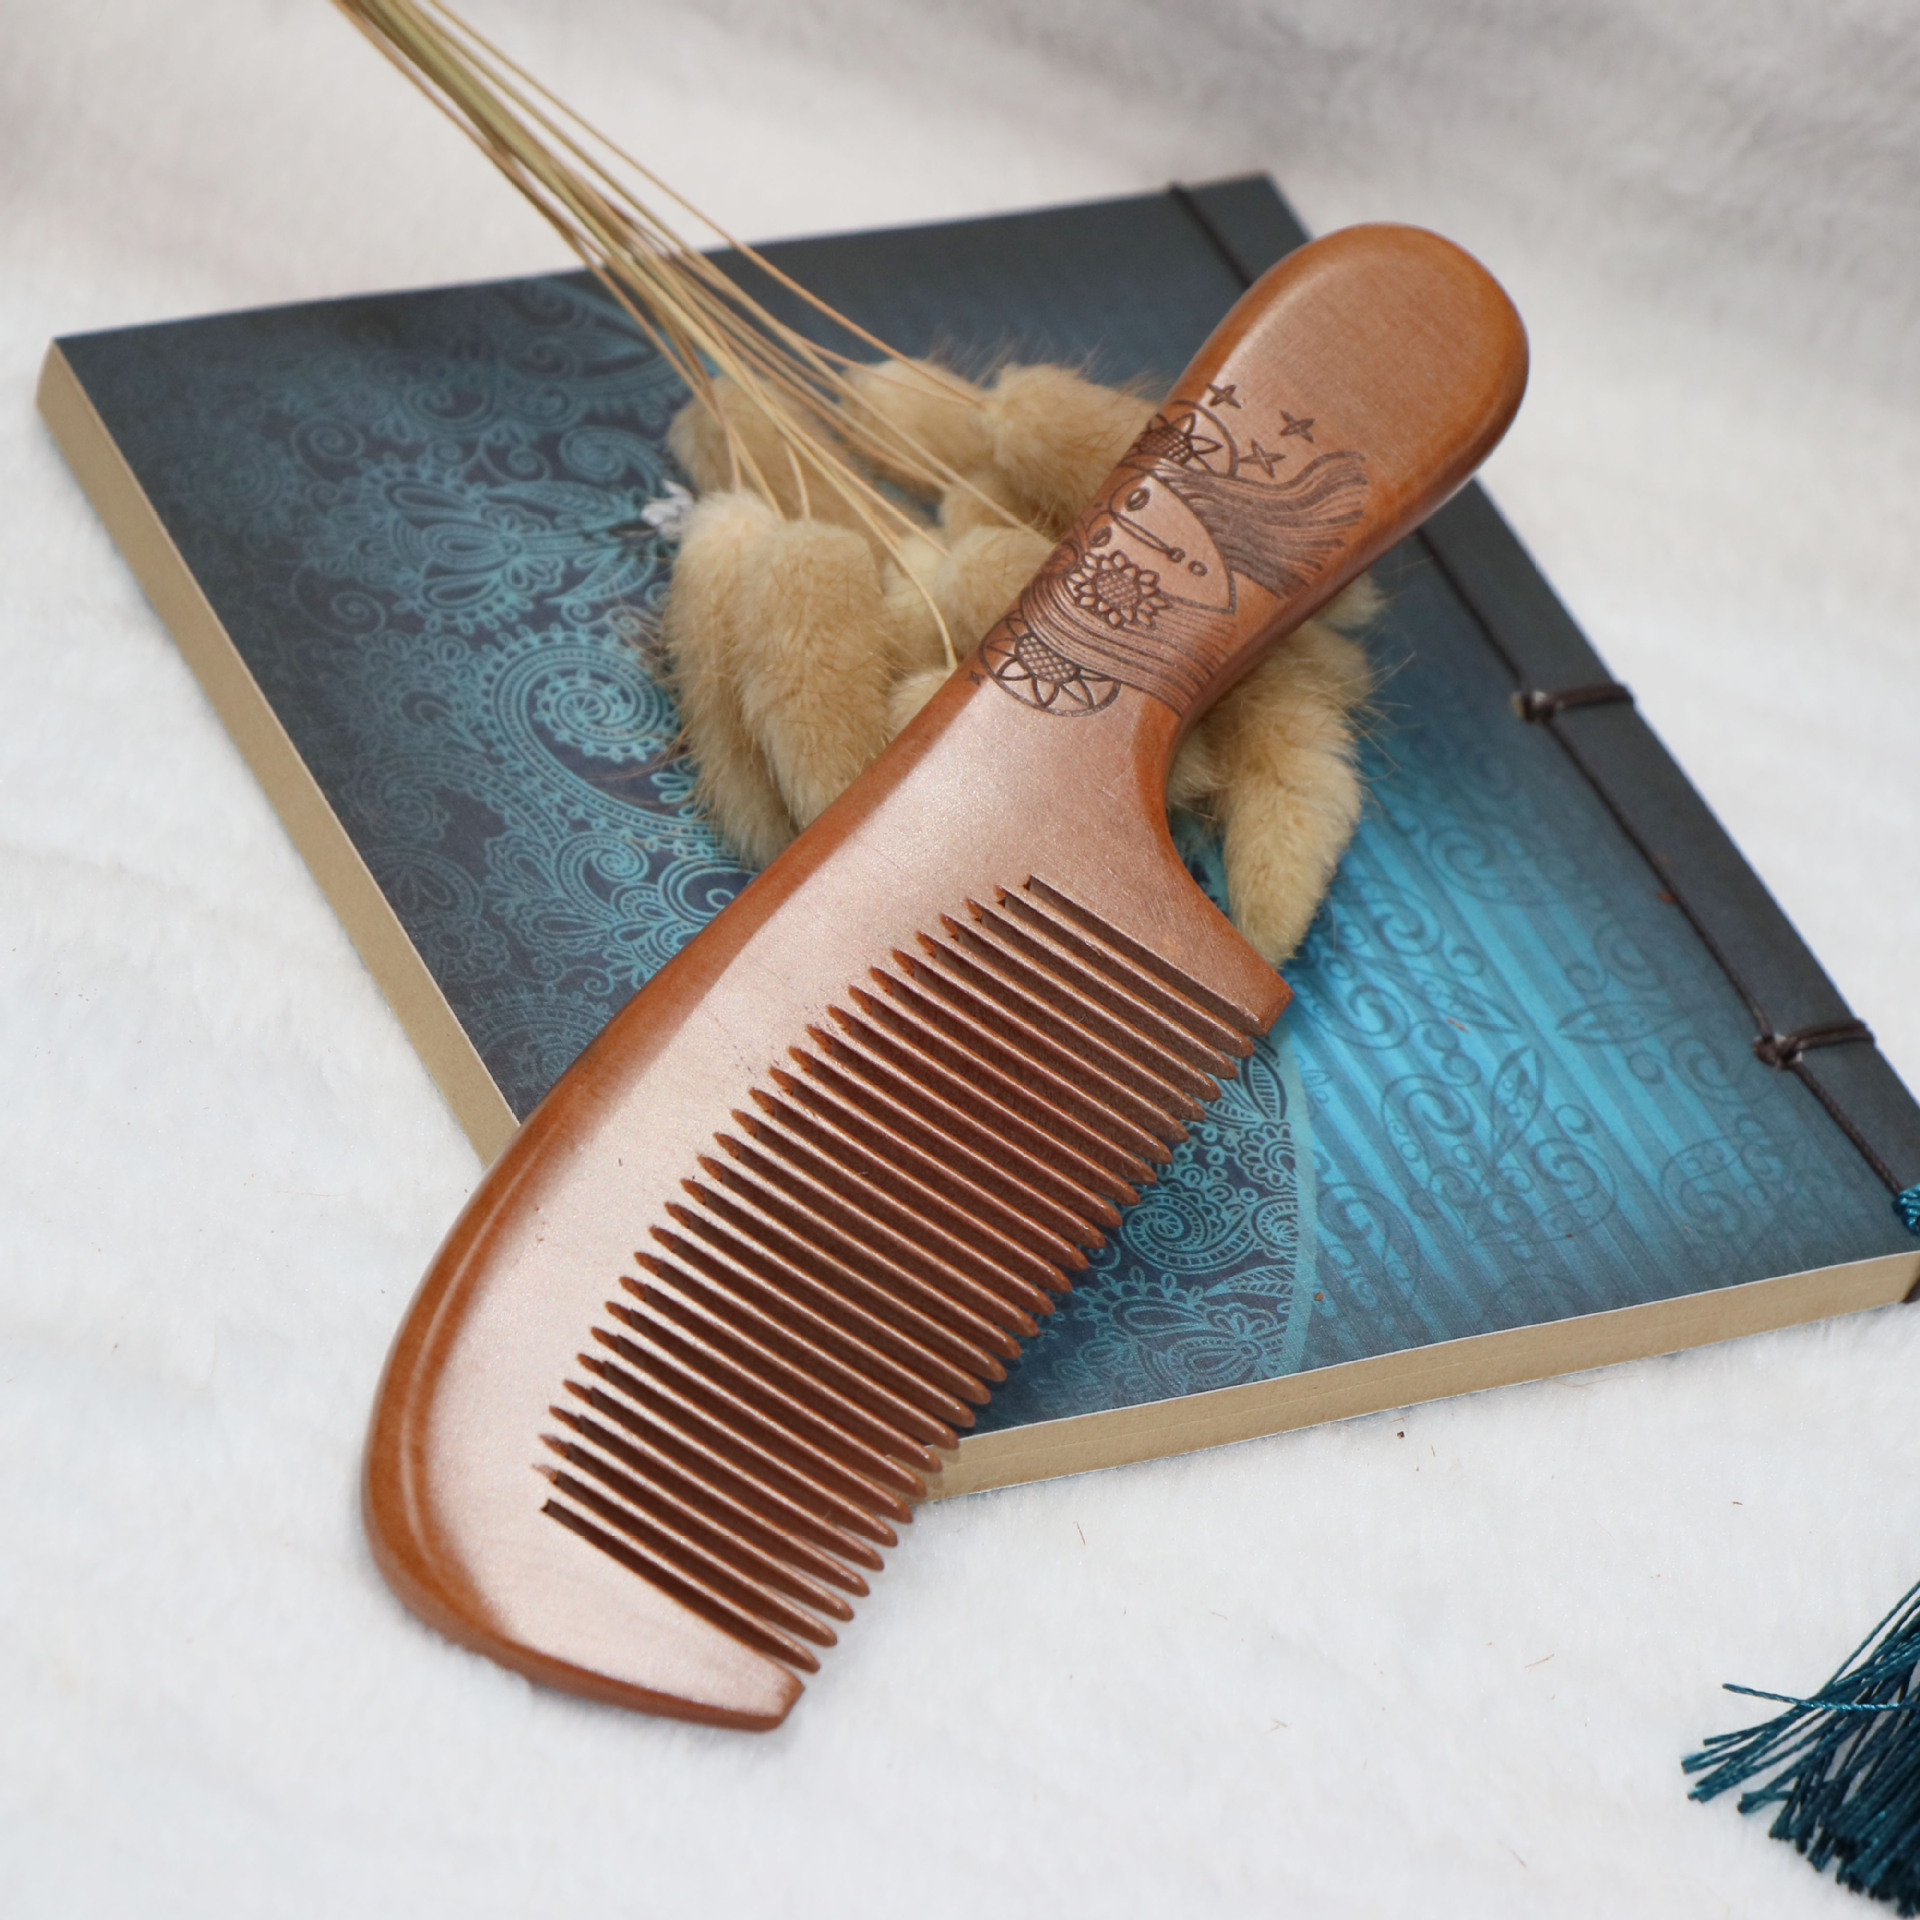 TI27 Fine old mahogany comb sandalwood comb anti-static hair loss hair comb c62 anti static peach wood comb sandalwood wide tooth comb hair comb